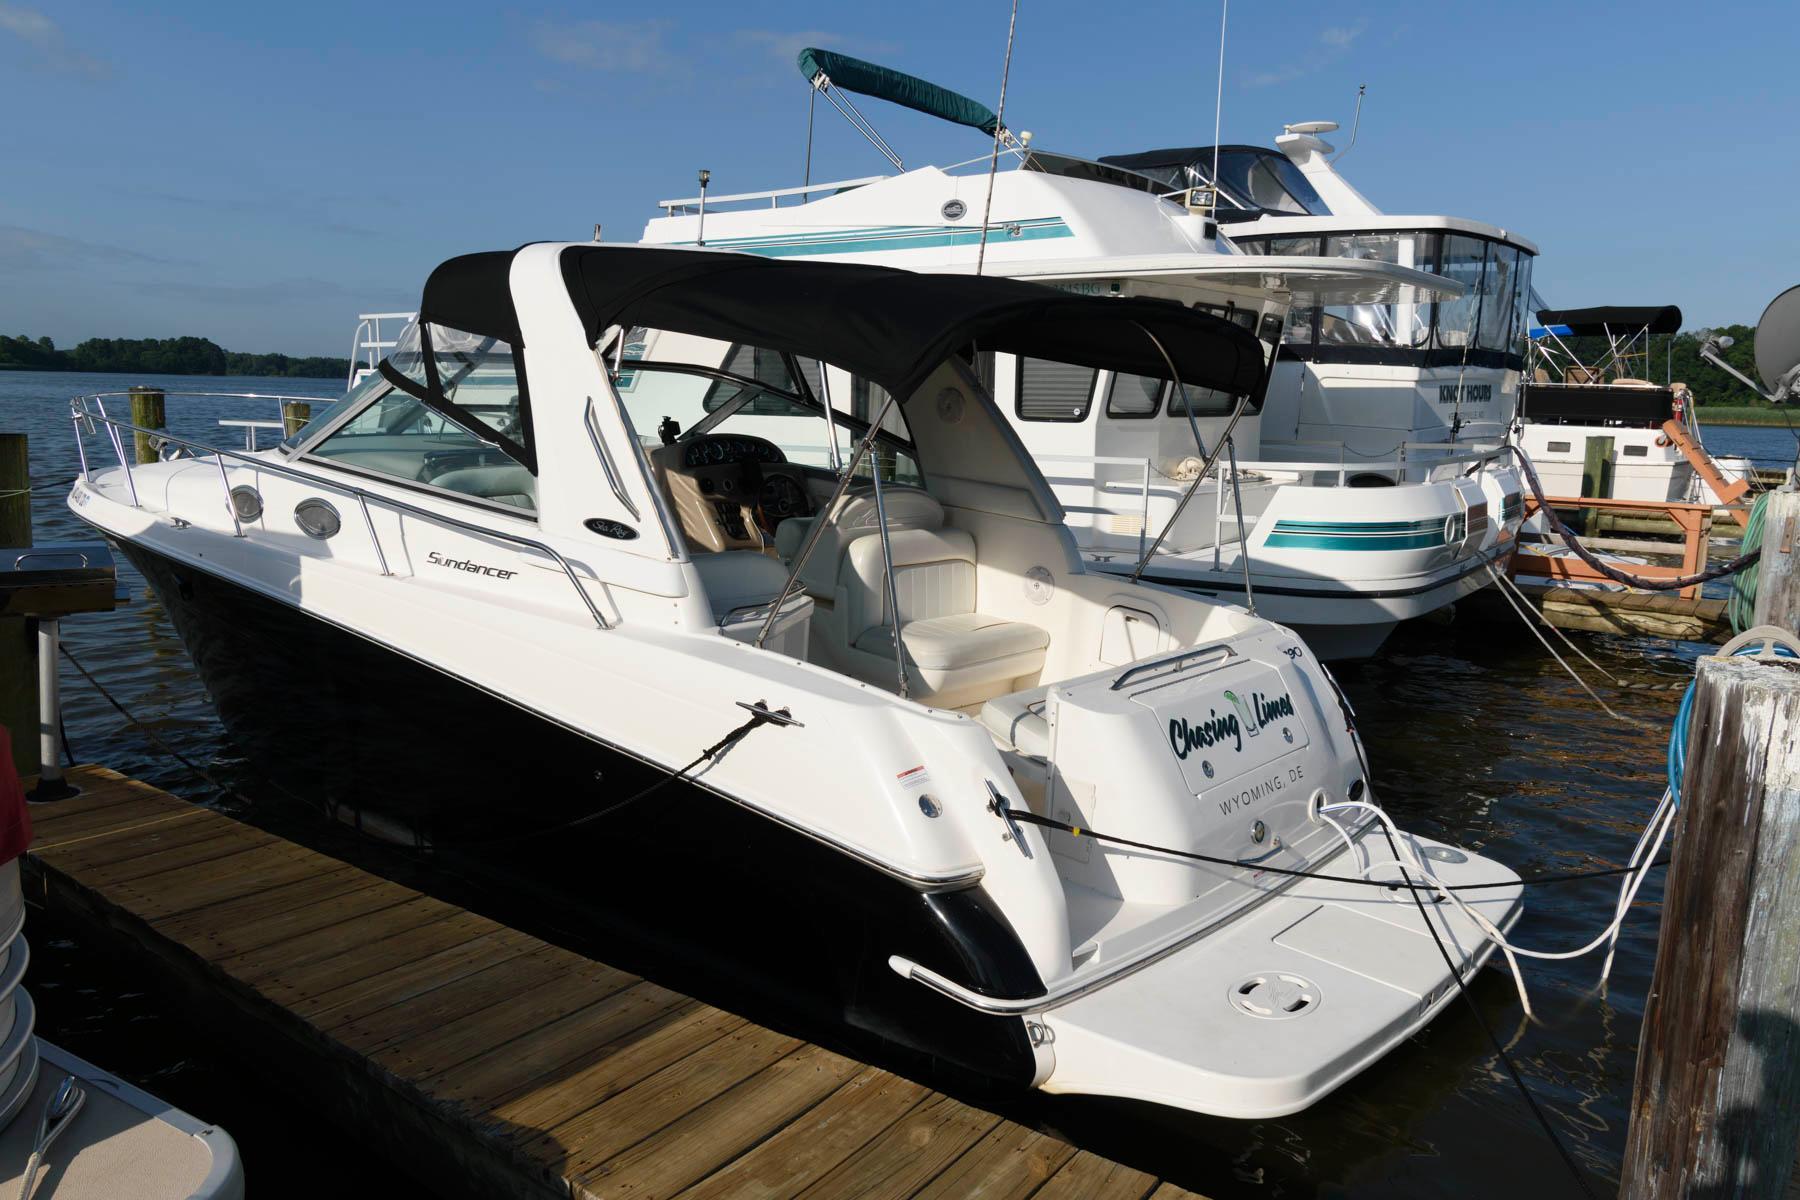 M 6191 VR Knot 10 Yacht Sales